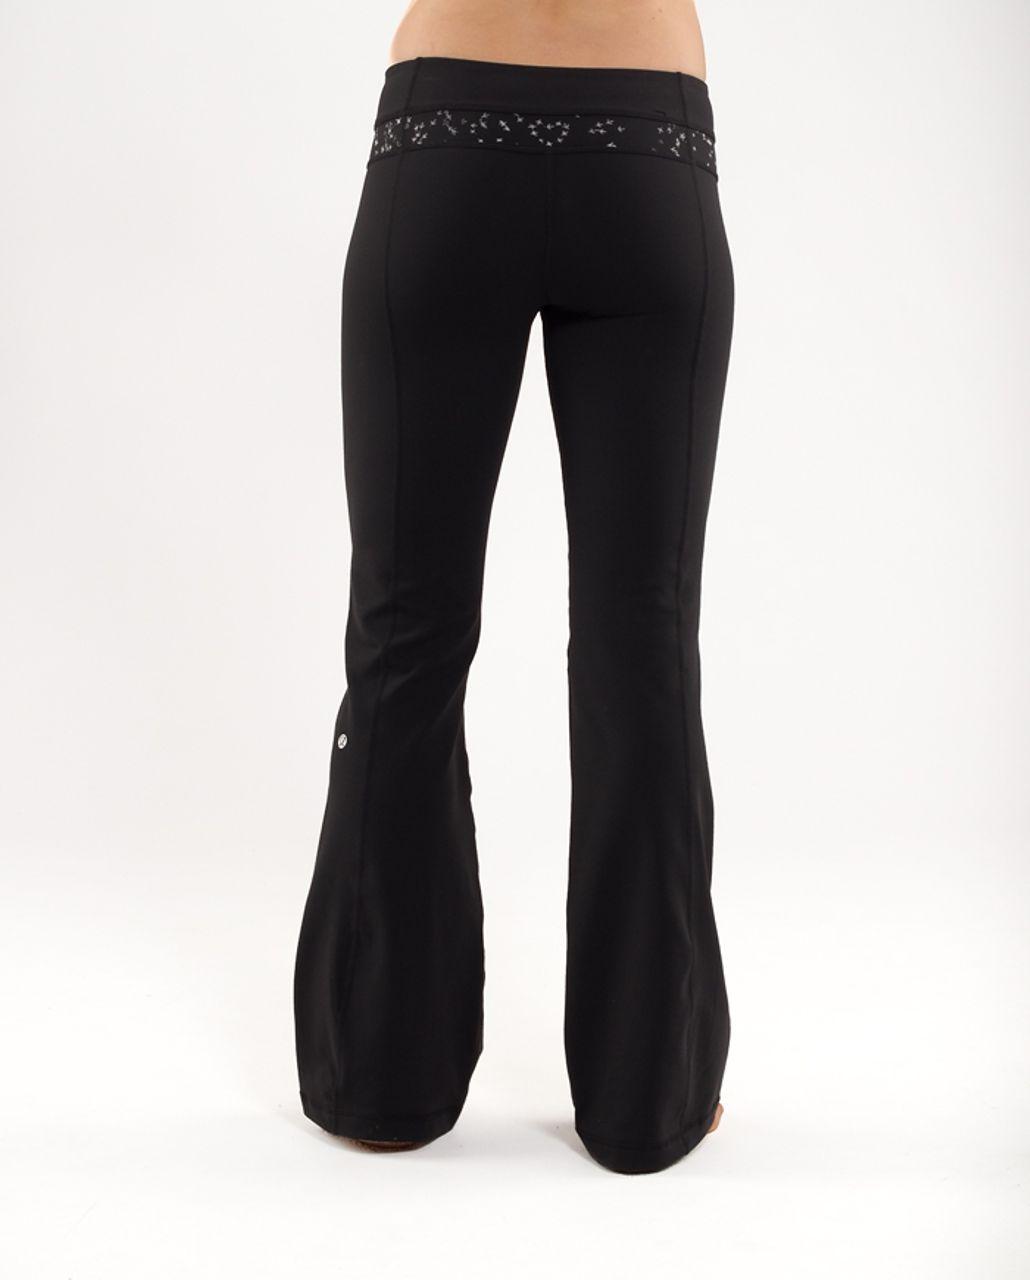 05d1022b0 Lululemon Groove Pant (Tall) - Black   Silver Pitter Patter Reflective -  lulu fanatics